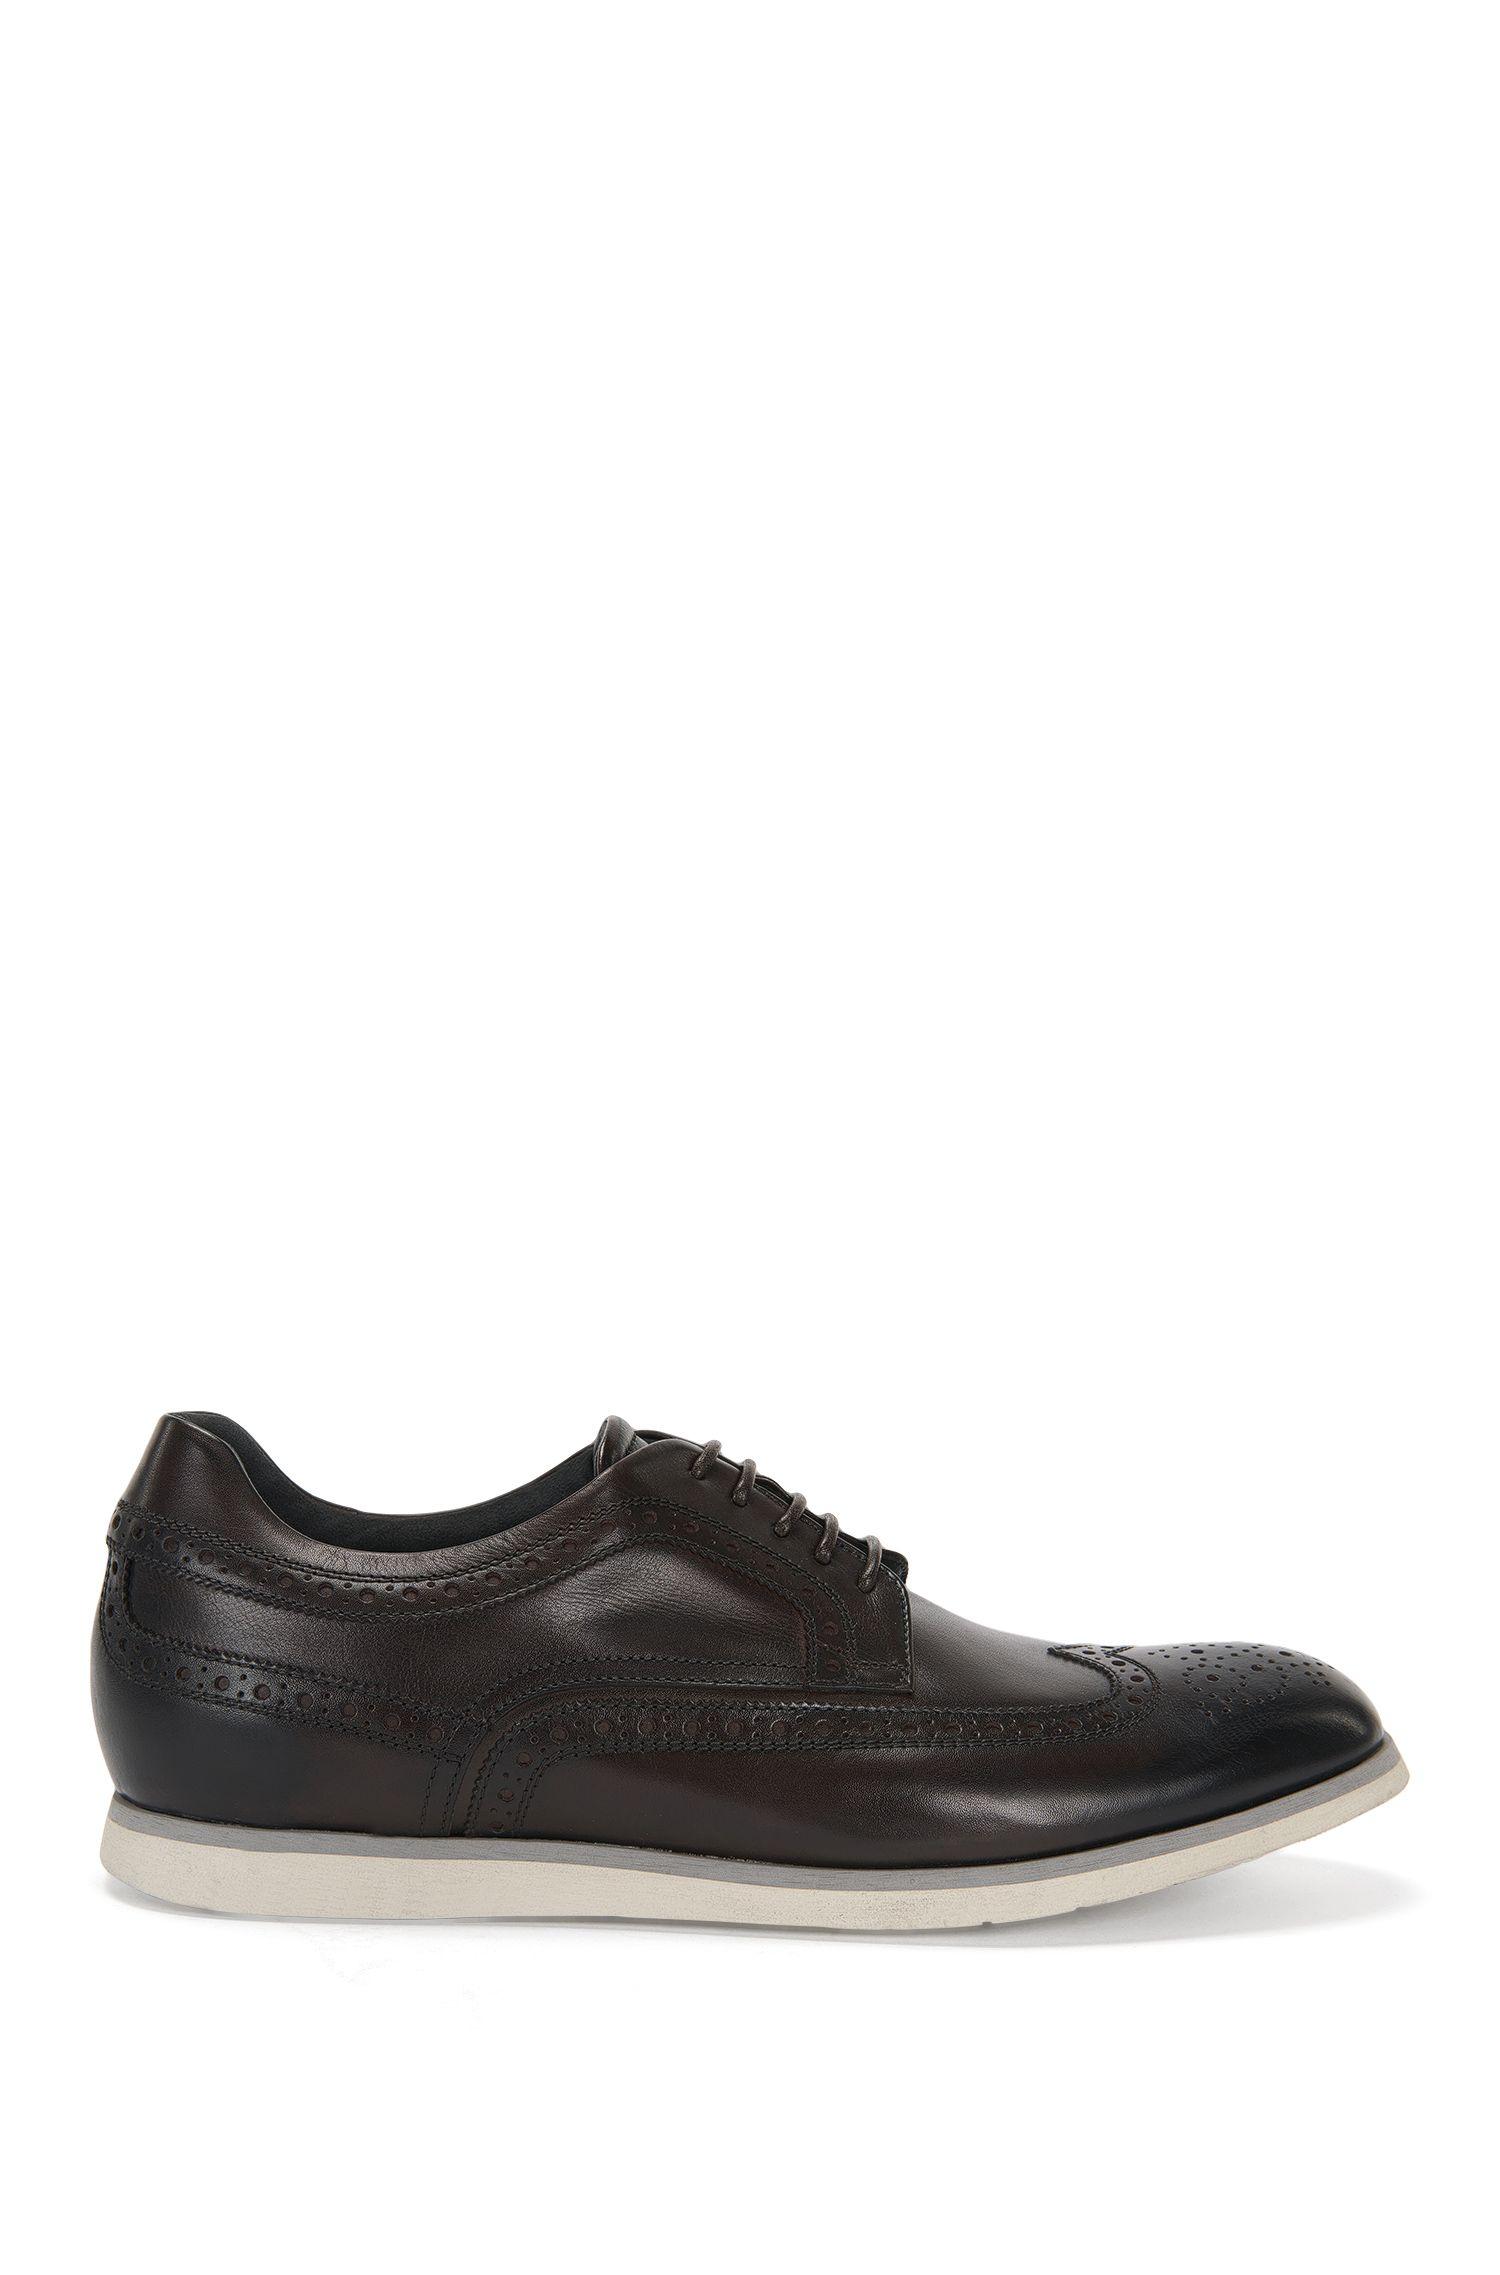 'Pegaso Derb Itwtb' | Italian Calfskin Brogue Derby Shoes